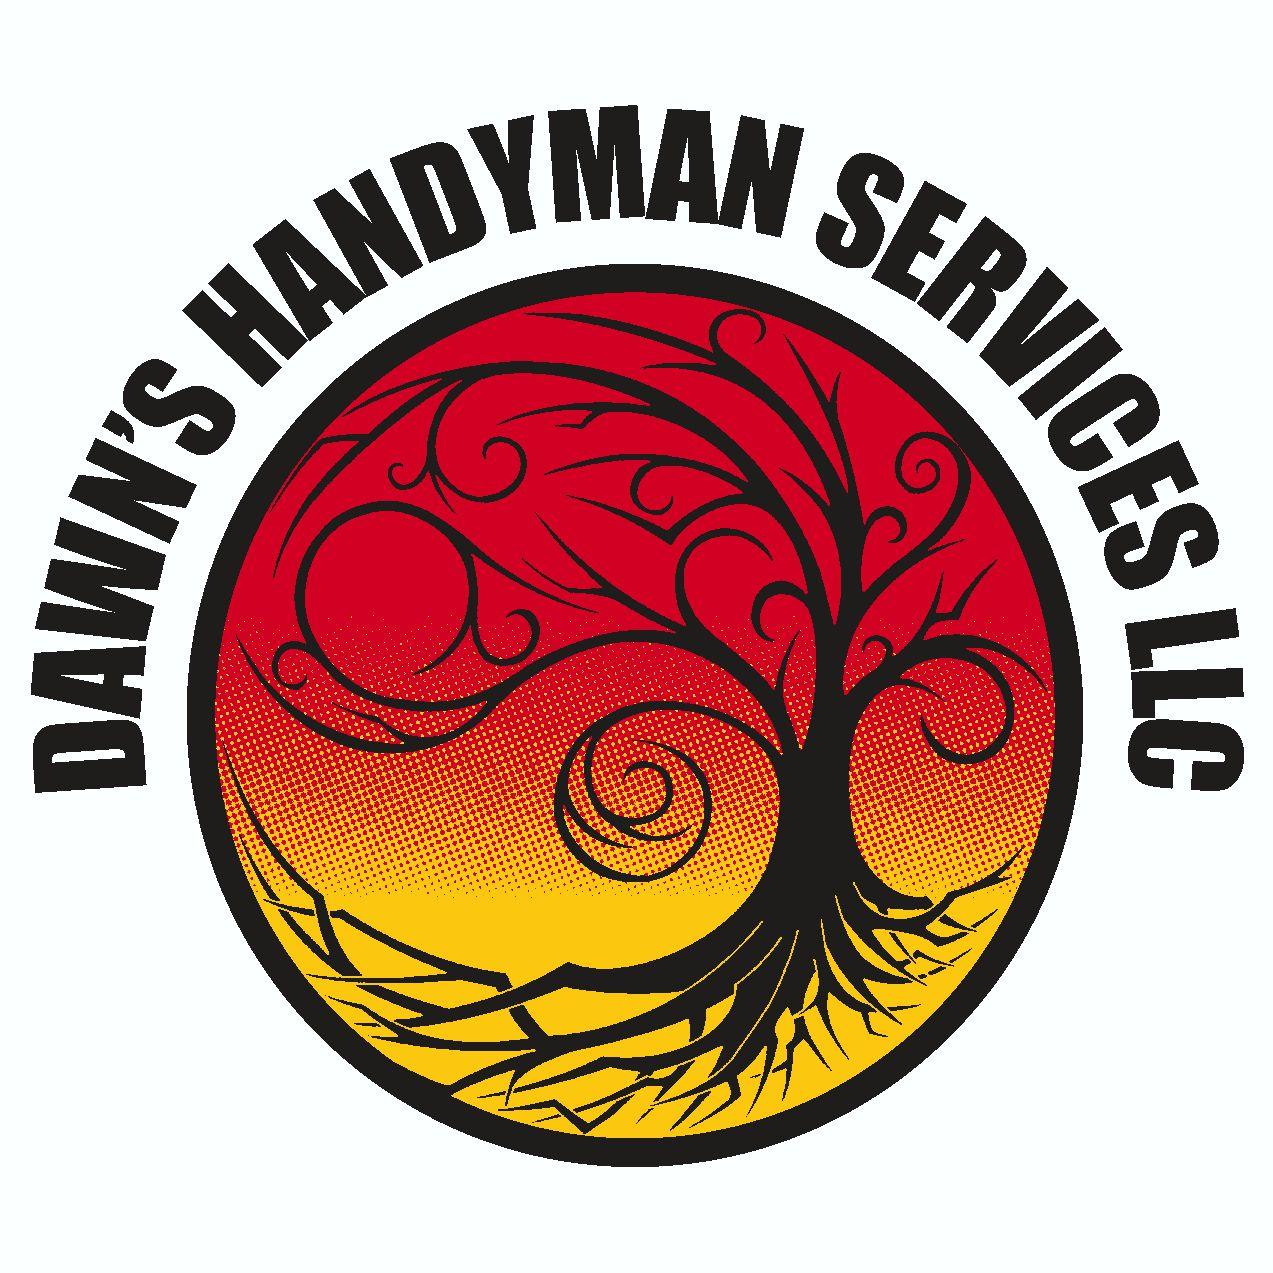 Dawn's Handyman Services  image